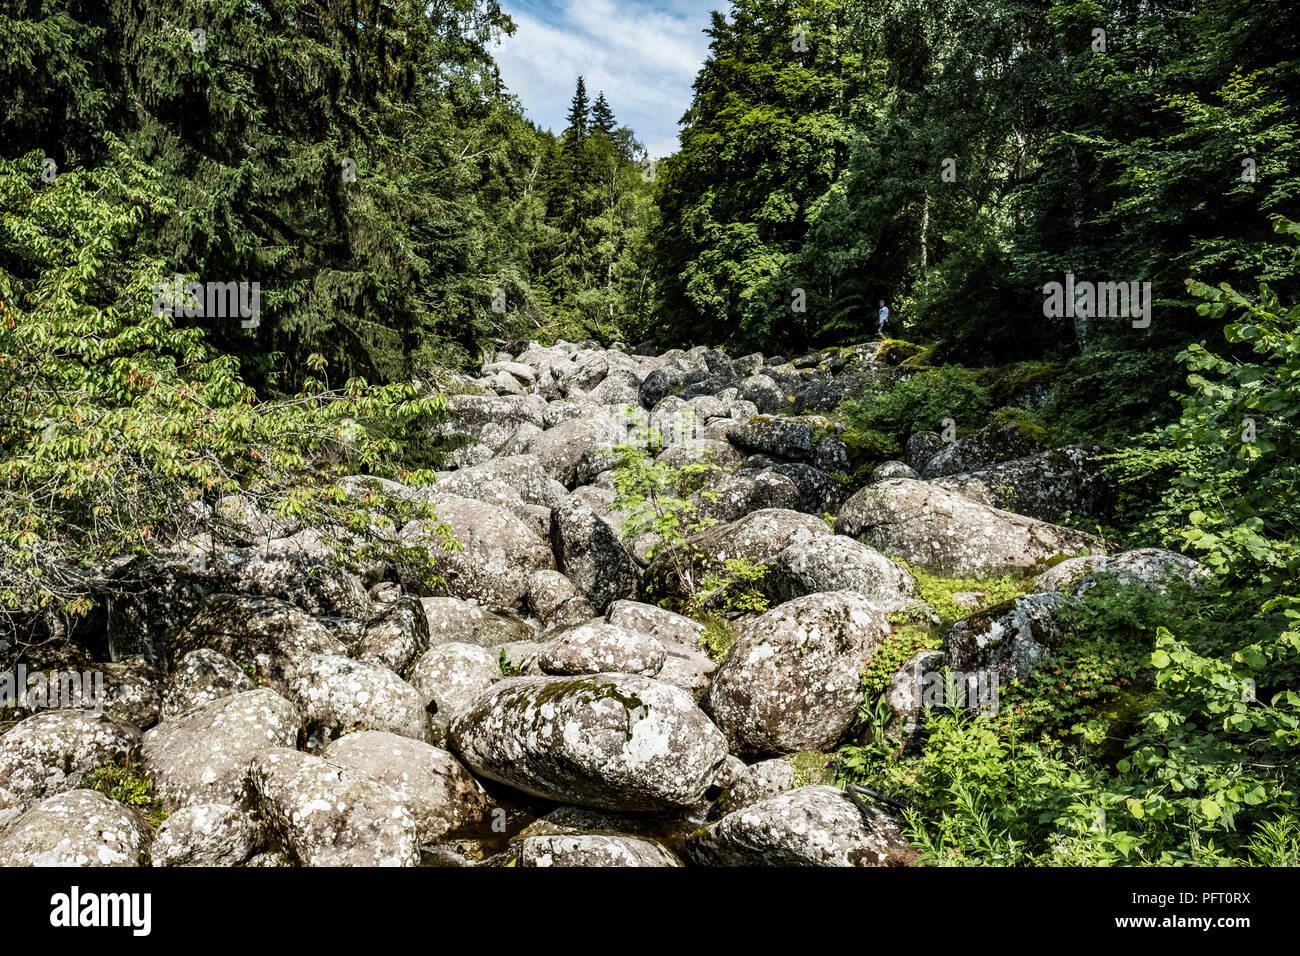 Goldener Steinfluß bei Sofia in Bulgarien - Stock Image